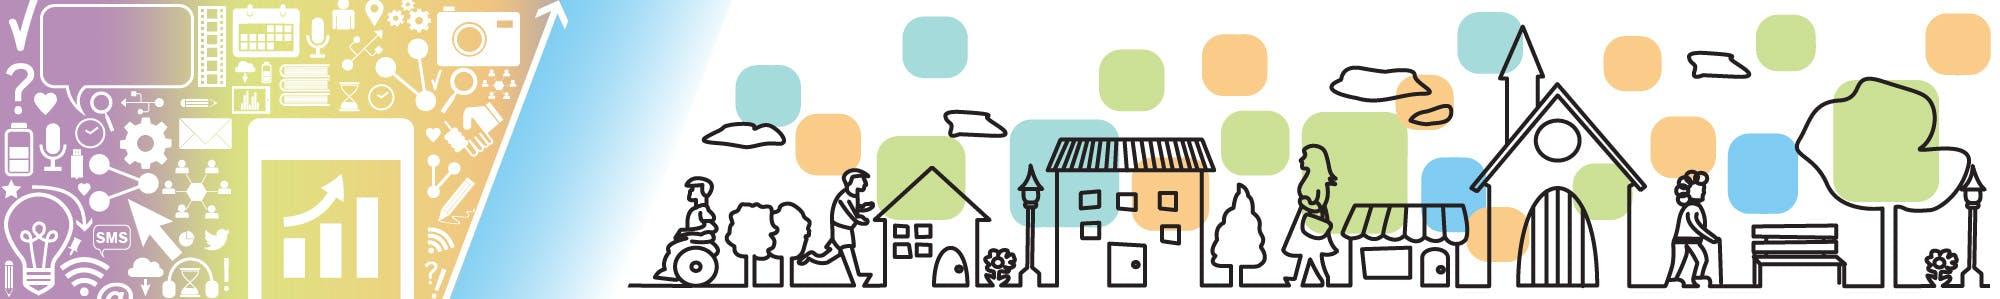 Community Safety Survey banner image